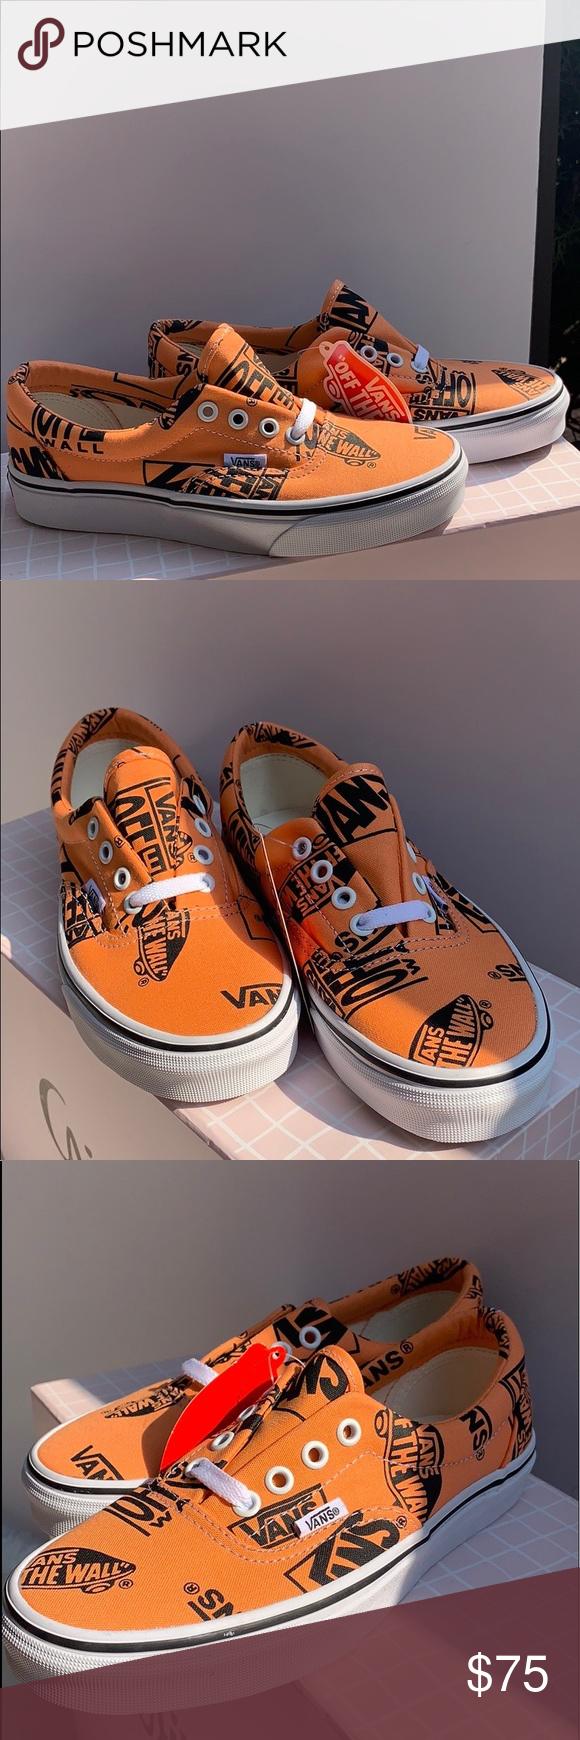 vans off the wall print shoe